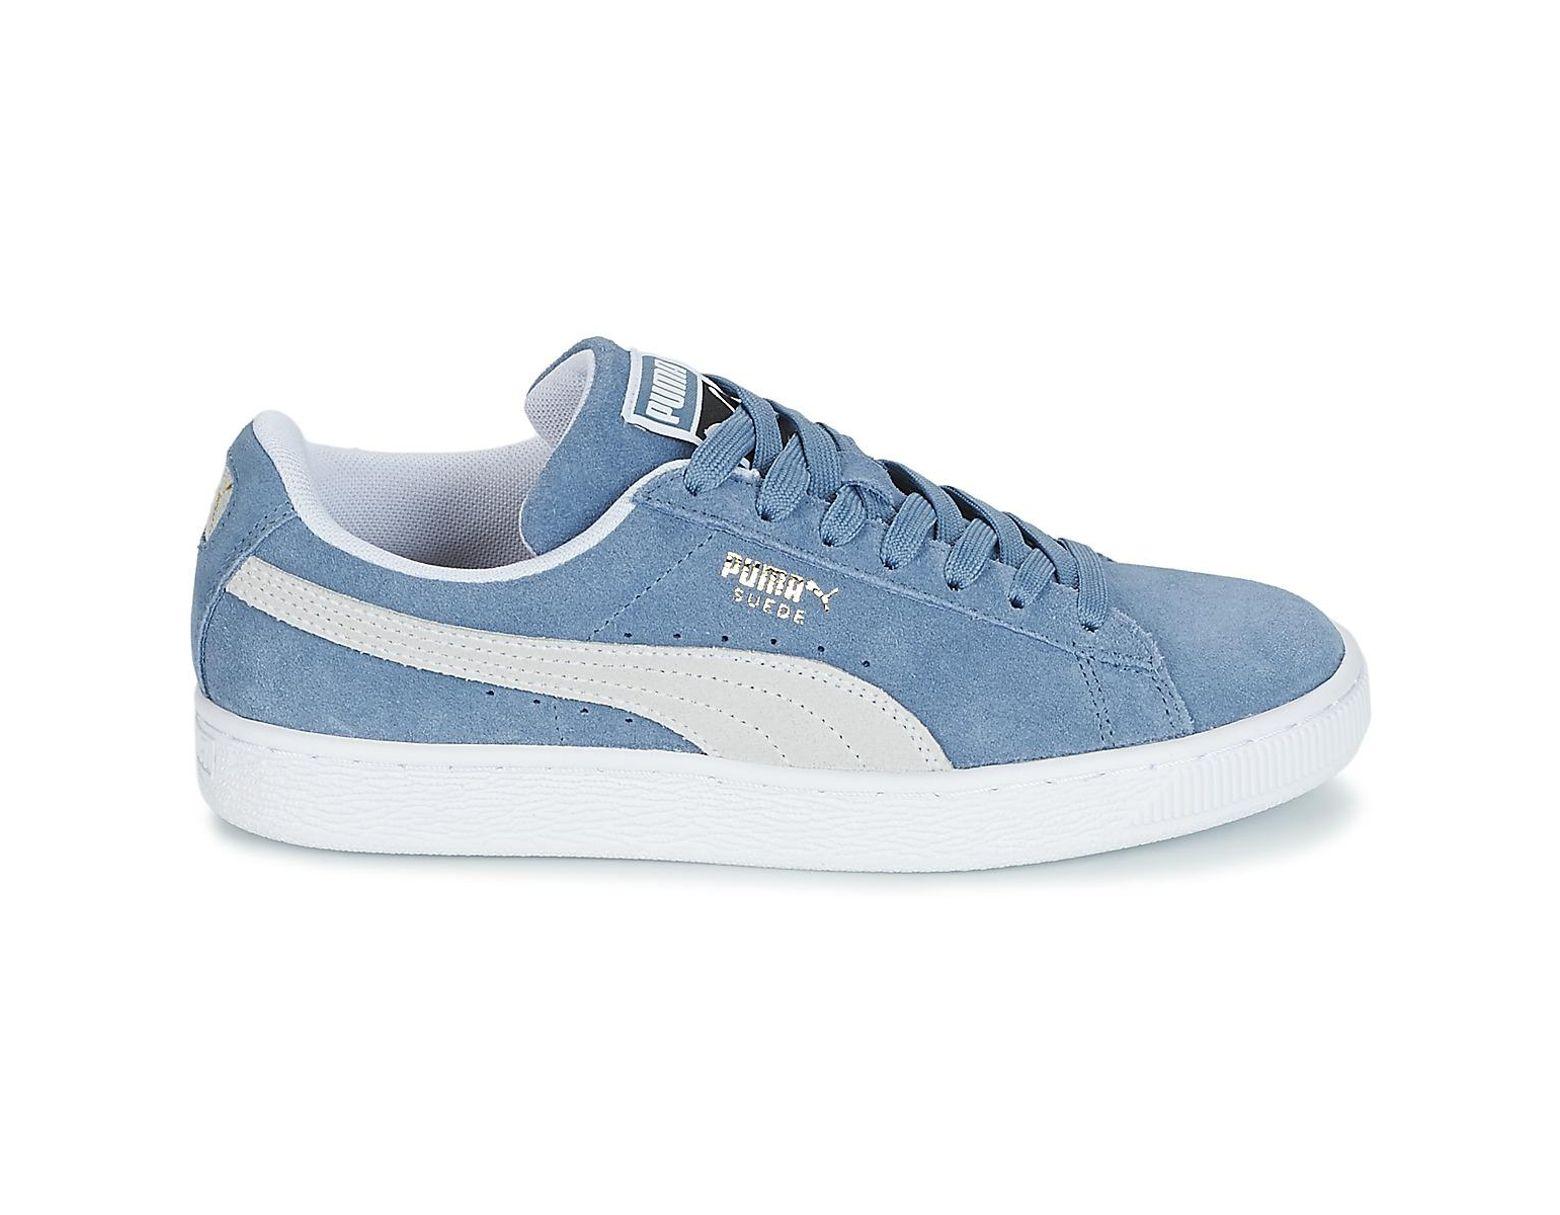 En Suede Classic Chaussures Femmes Bleu CxoBde